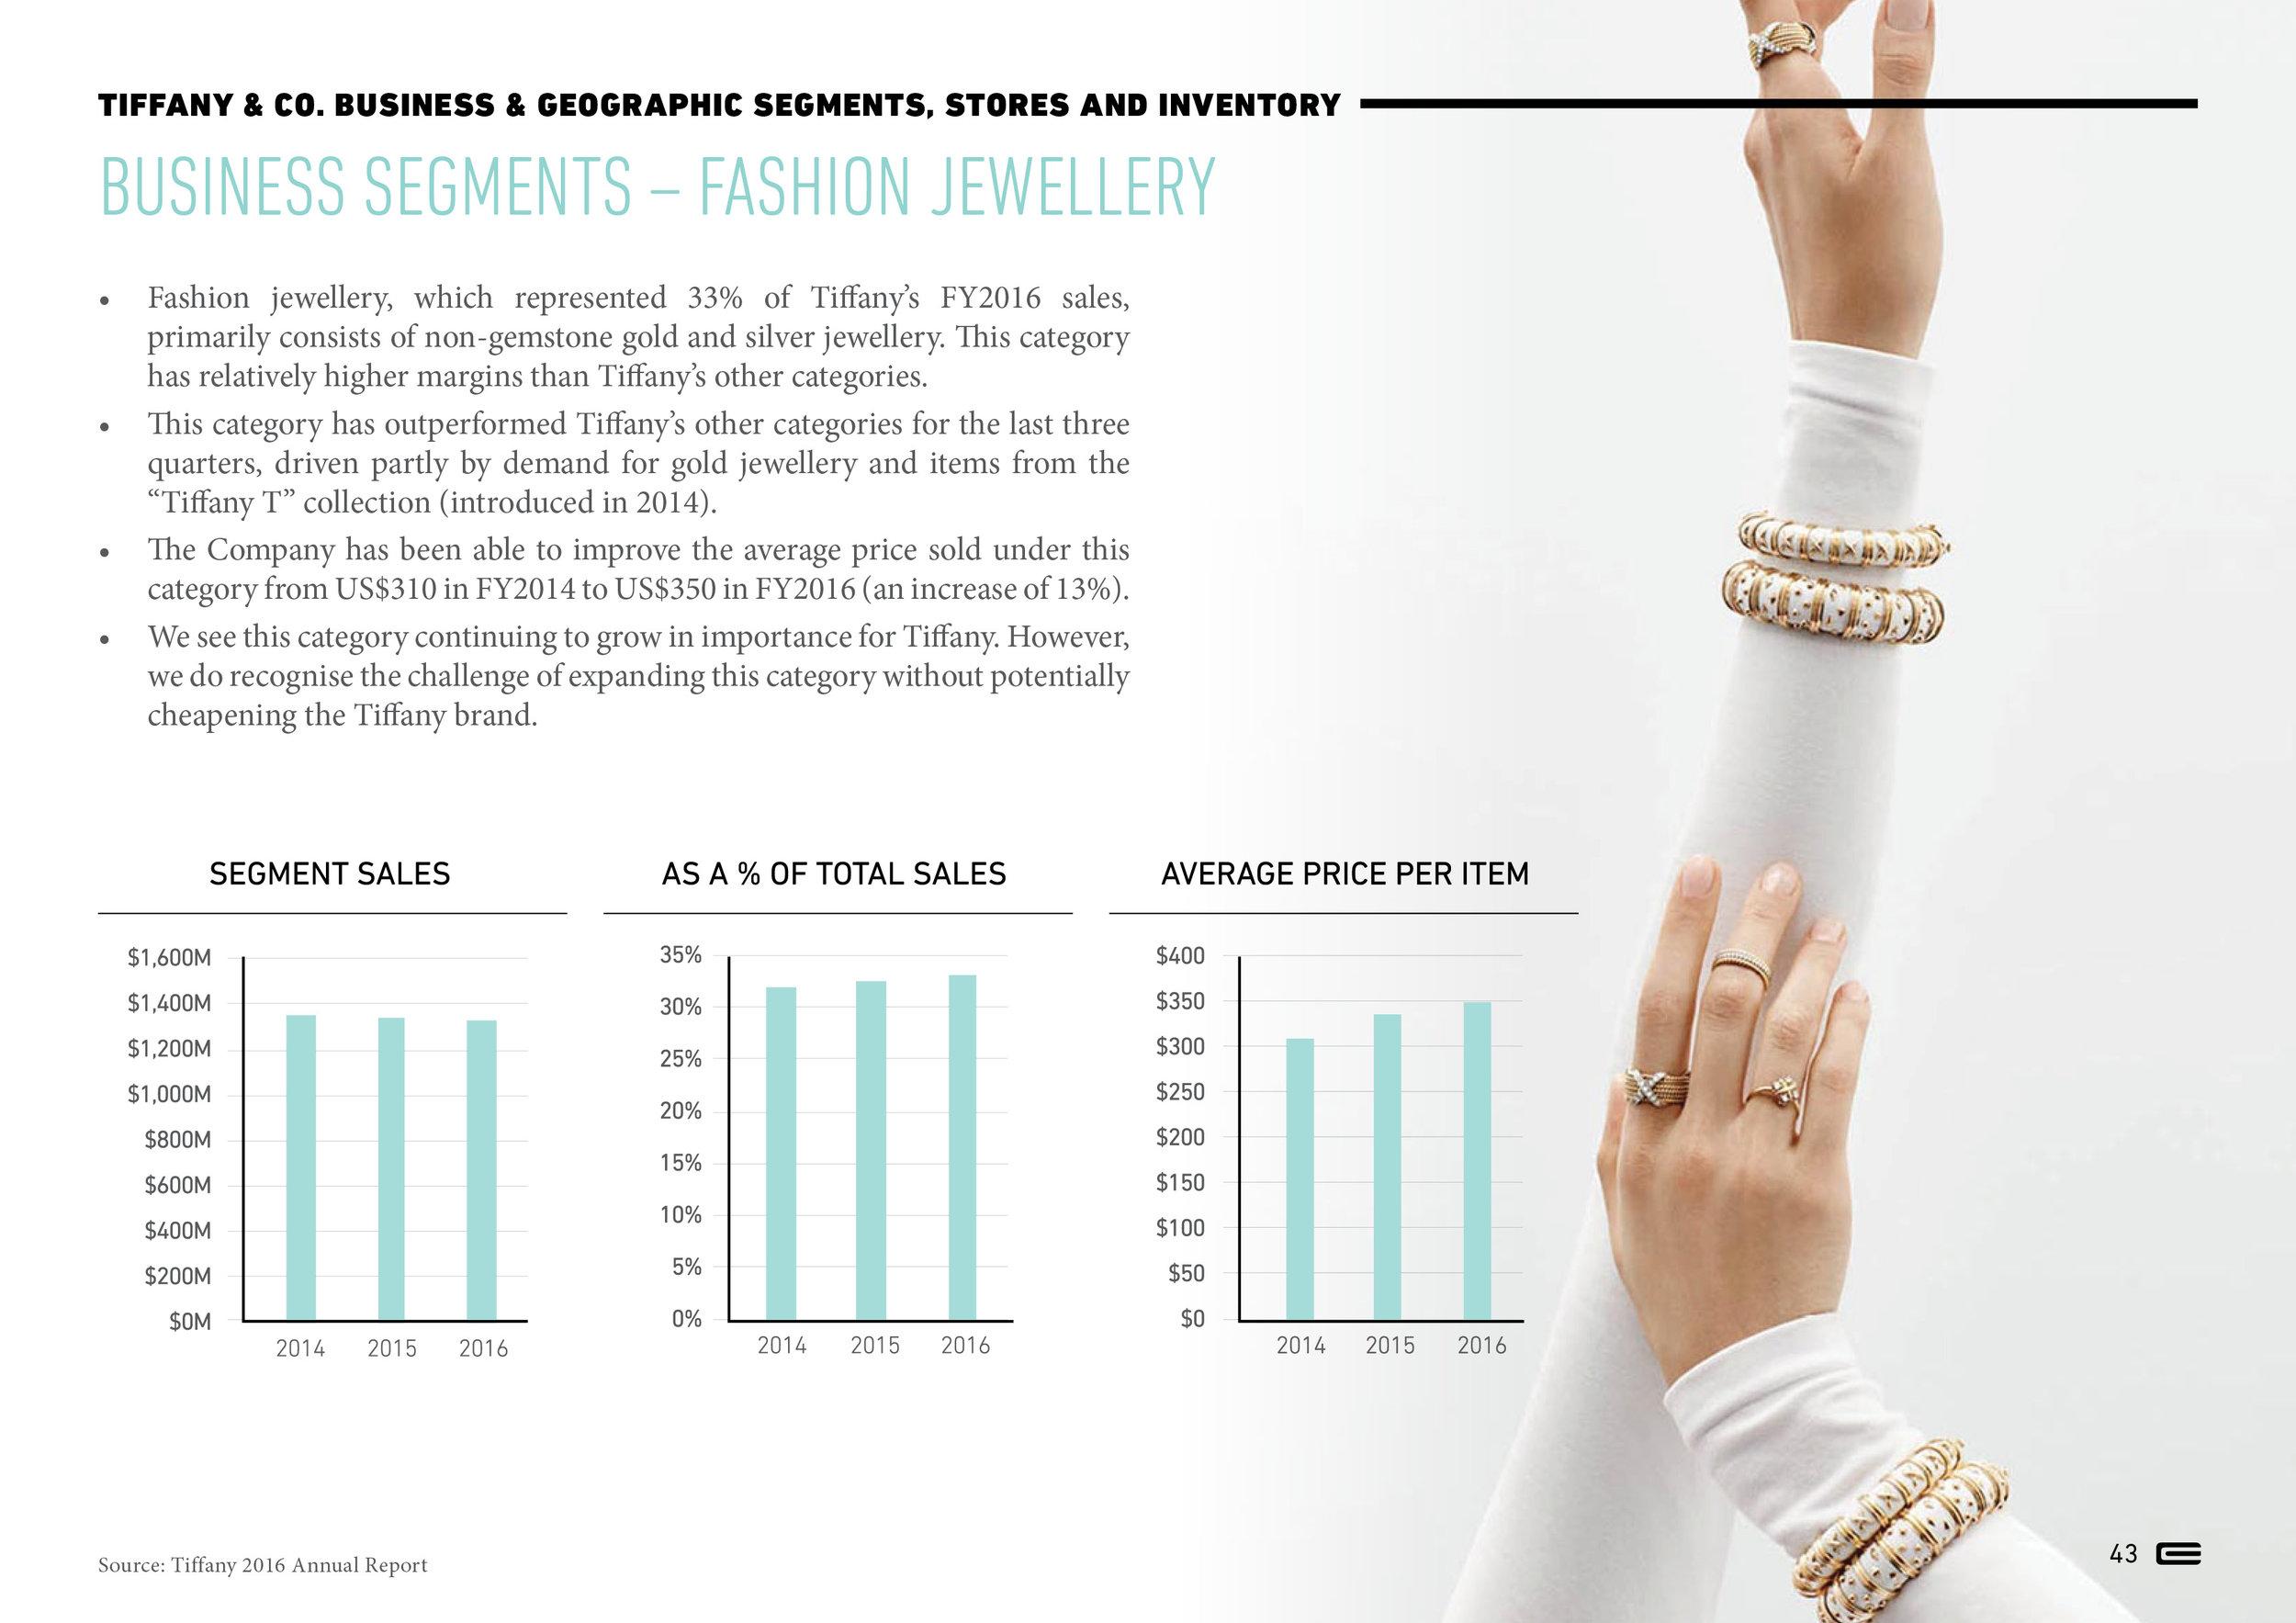 EC - VIC 2018 Presentation on Tiffany43.jpg